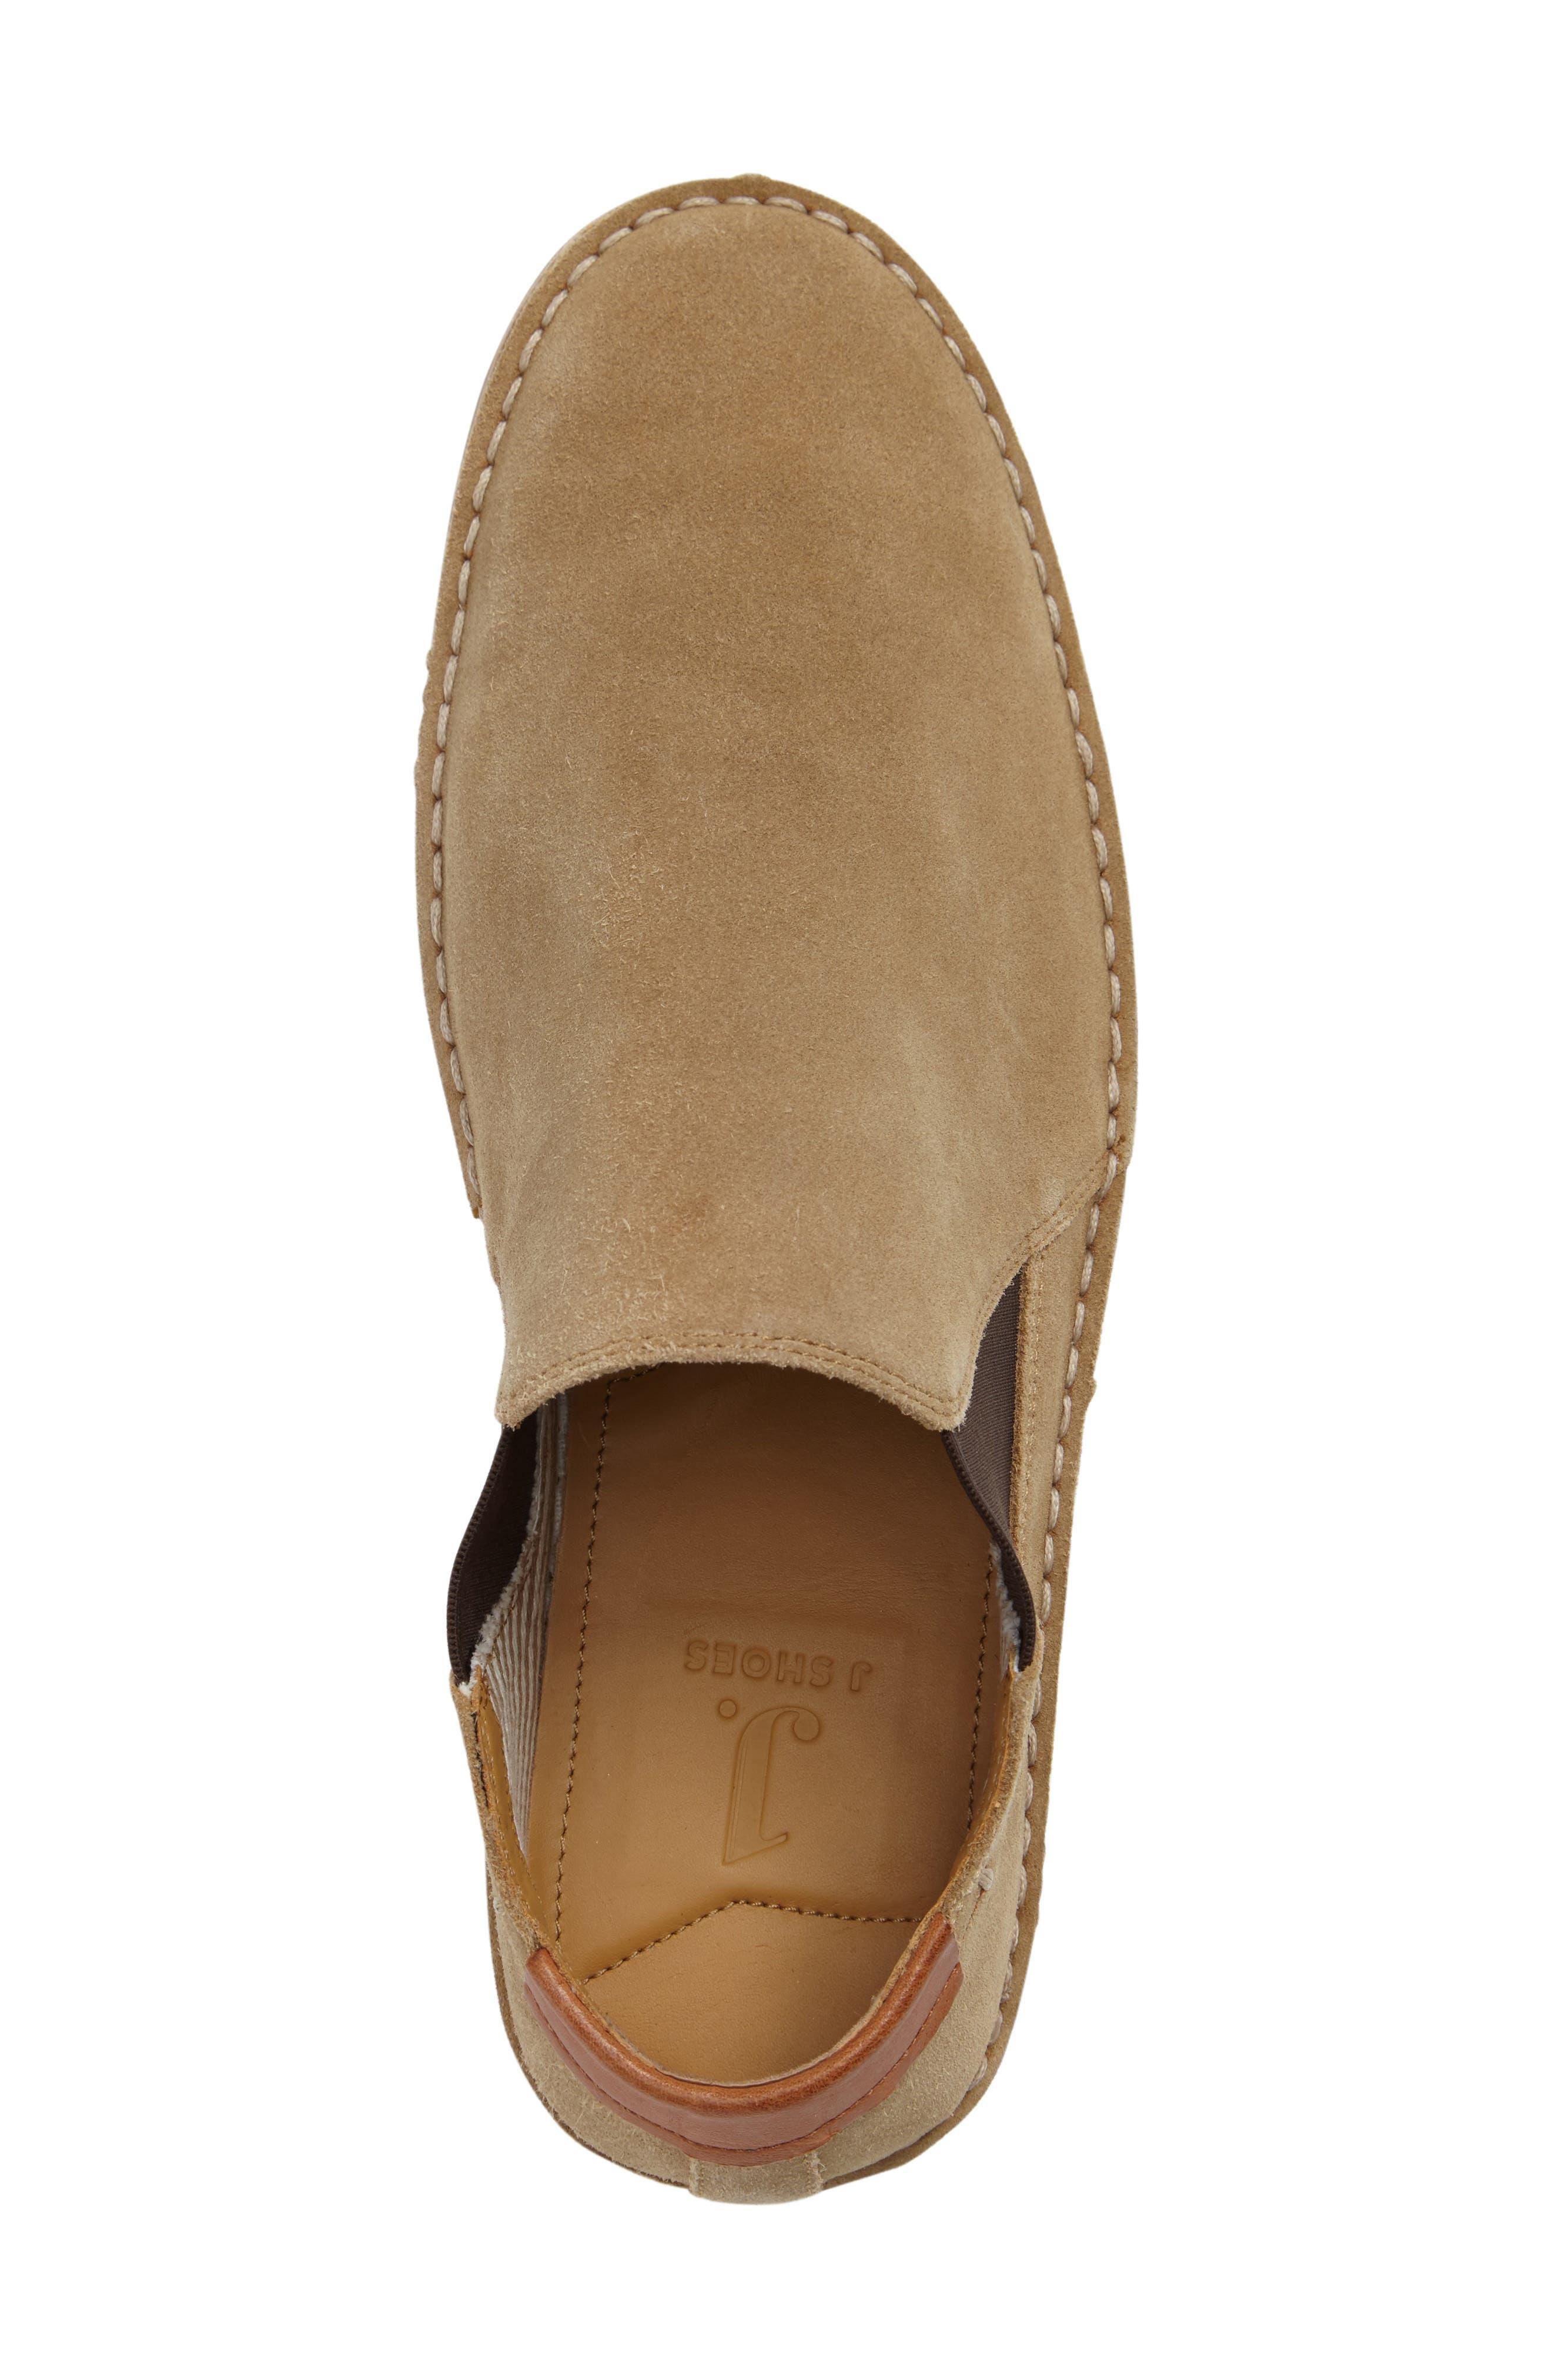 Hunters Chelsea Boot,                             Alternate thumbnail 3, color,                             Studland